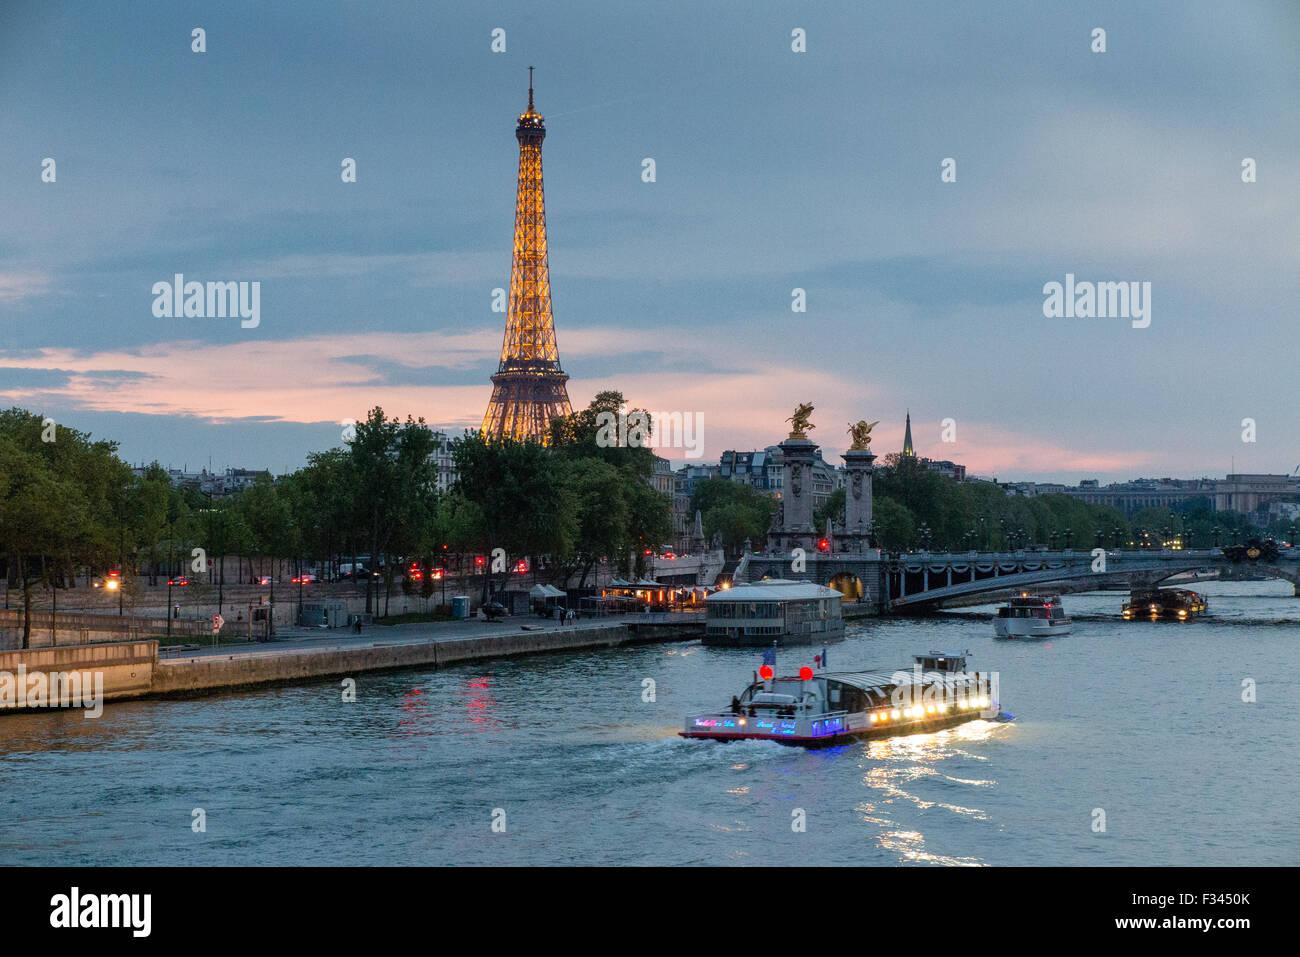 the Eiffel Tower & River Seine, Paris, France - Stock Image